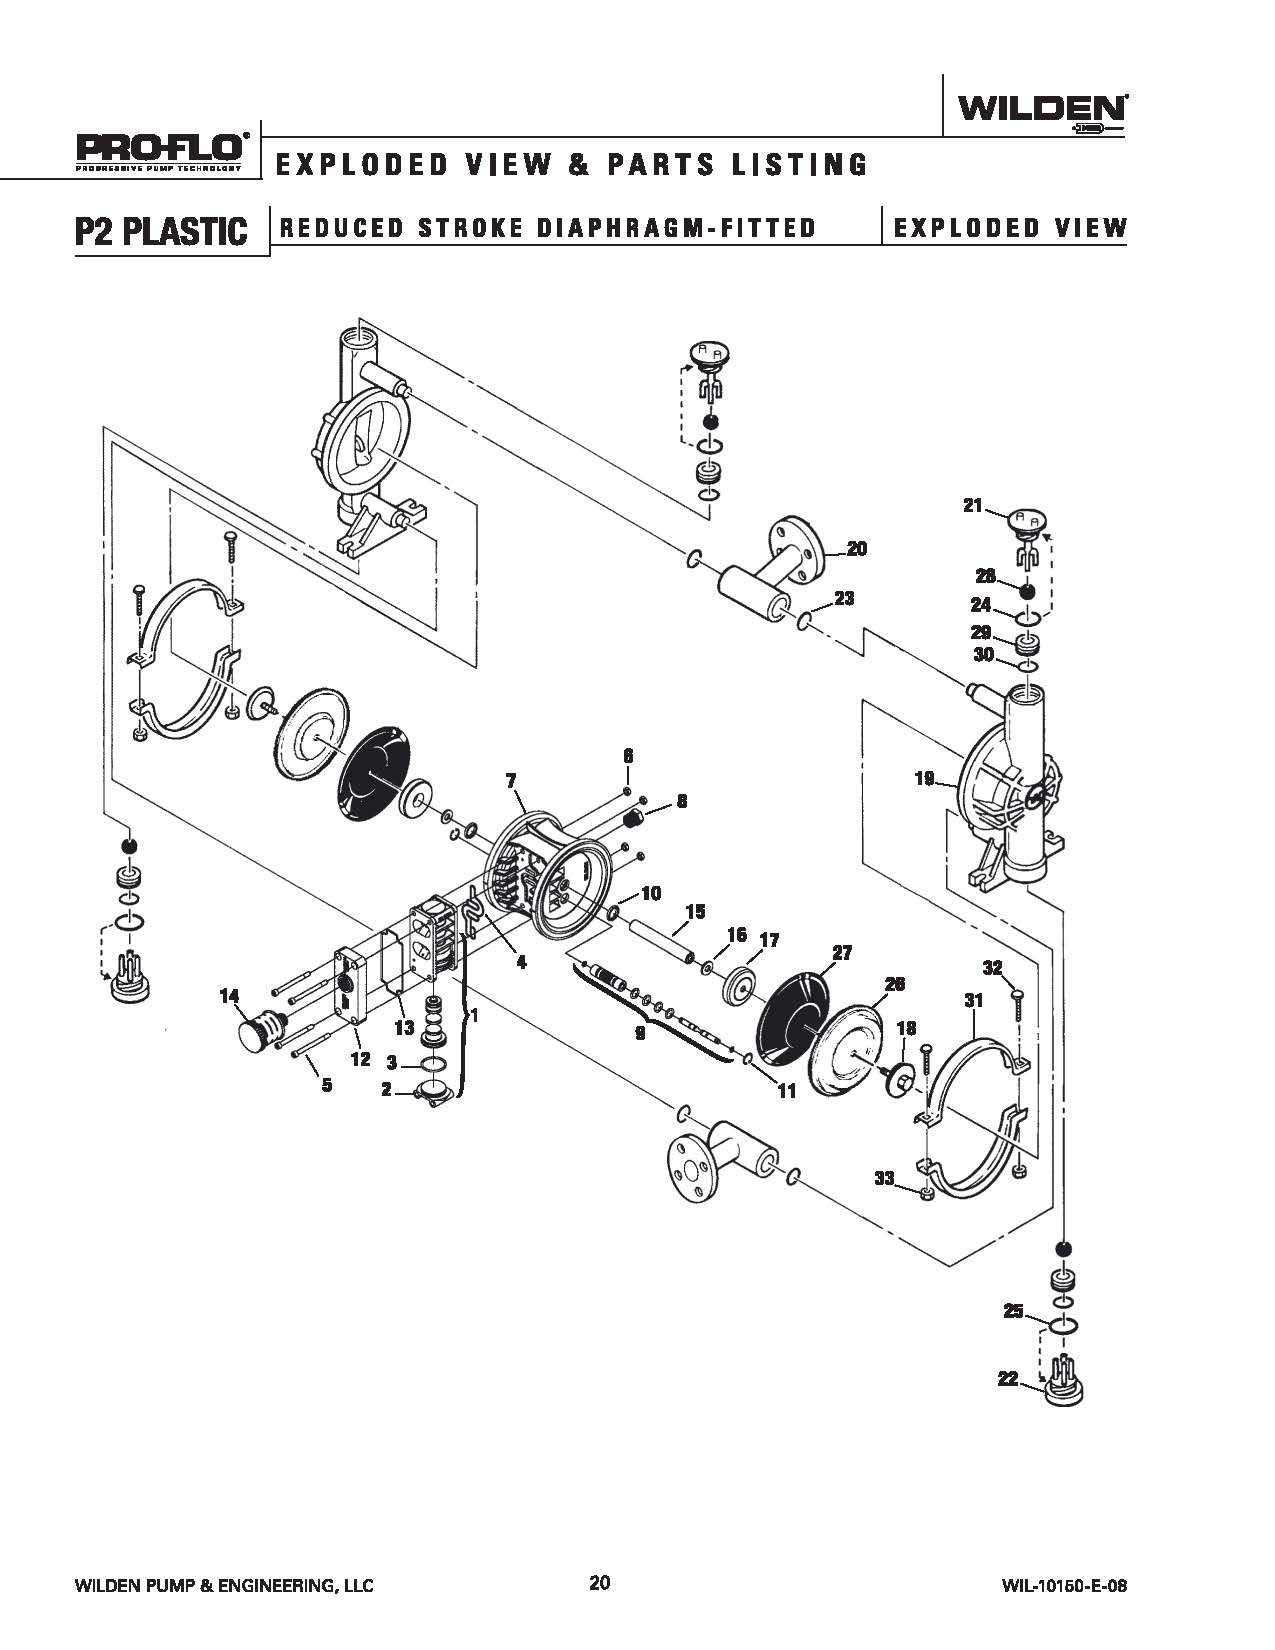 Wilden P2 Original Plastic Reduced Stroke Ptfe